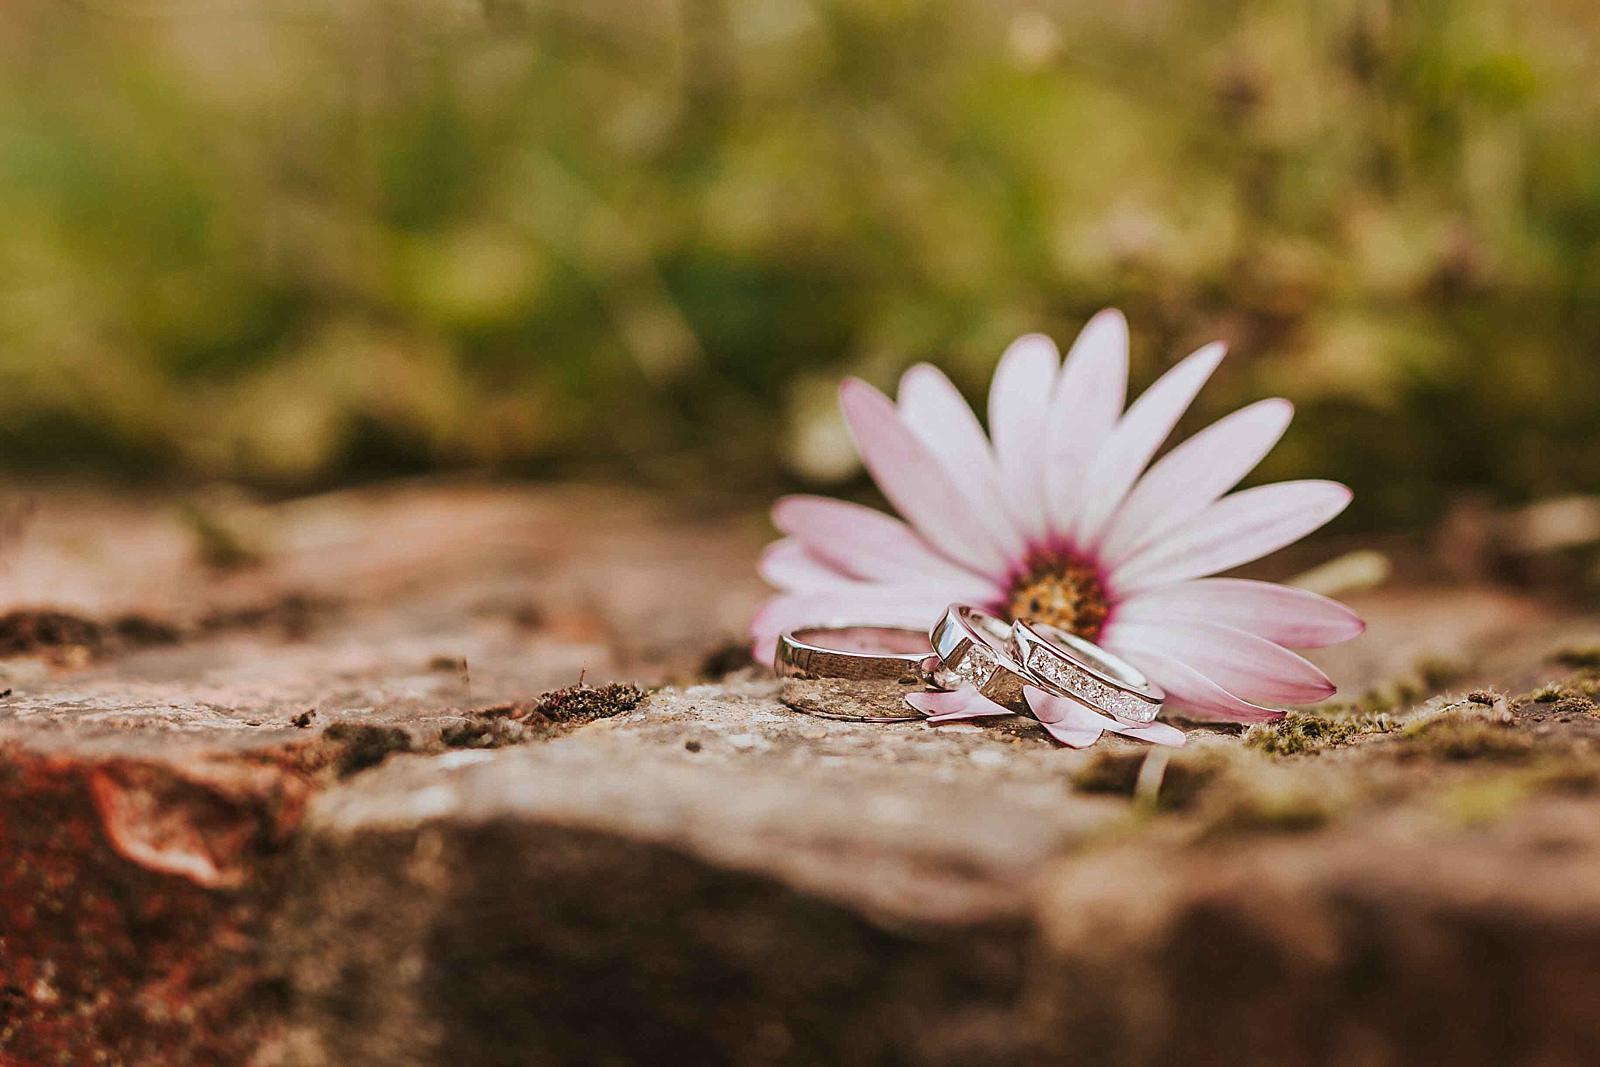 granary-at-fawsly-wedding-paula-stephen-012